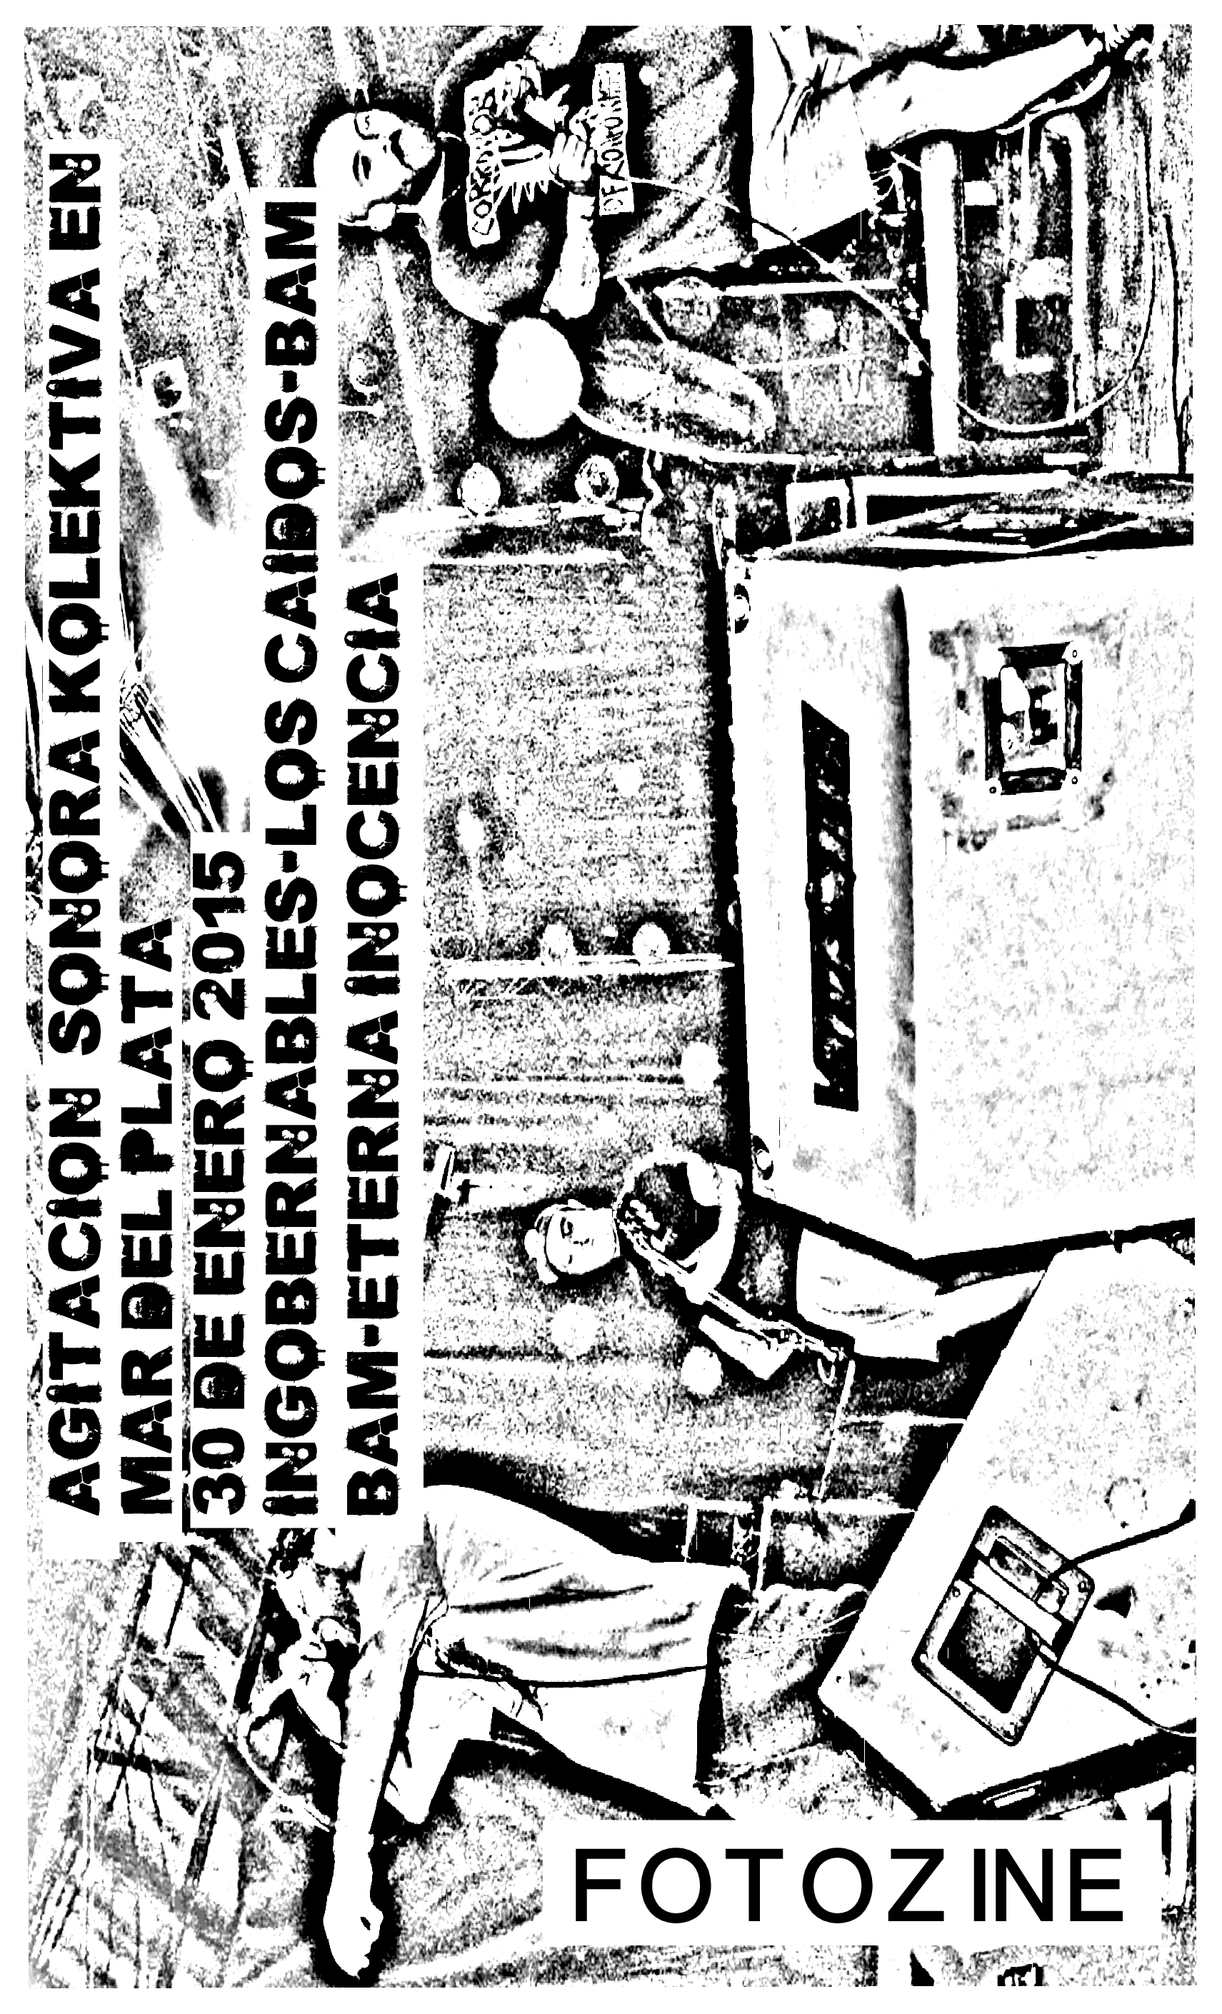 REPORTE AGITACION KOLEKTIVA ETERNA INOCENCIA-LOS CAIDOS-INGOBERNABLES-BAM BAM  2015 MAR DEL PLATA FEBRERO